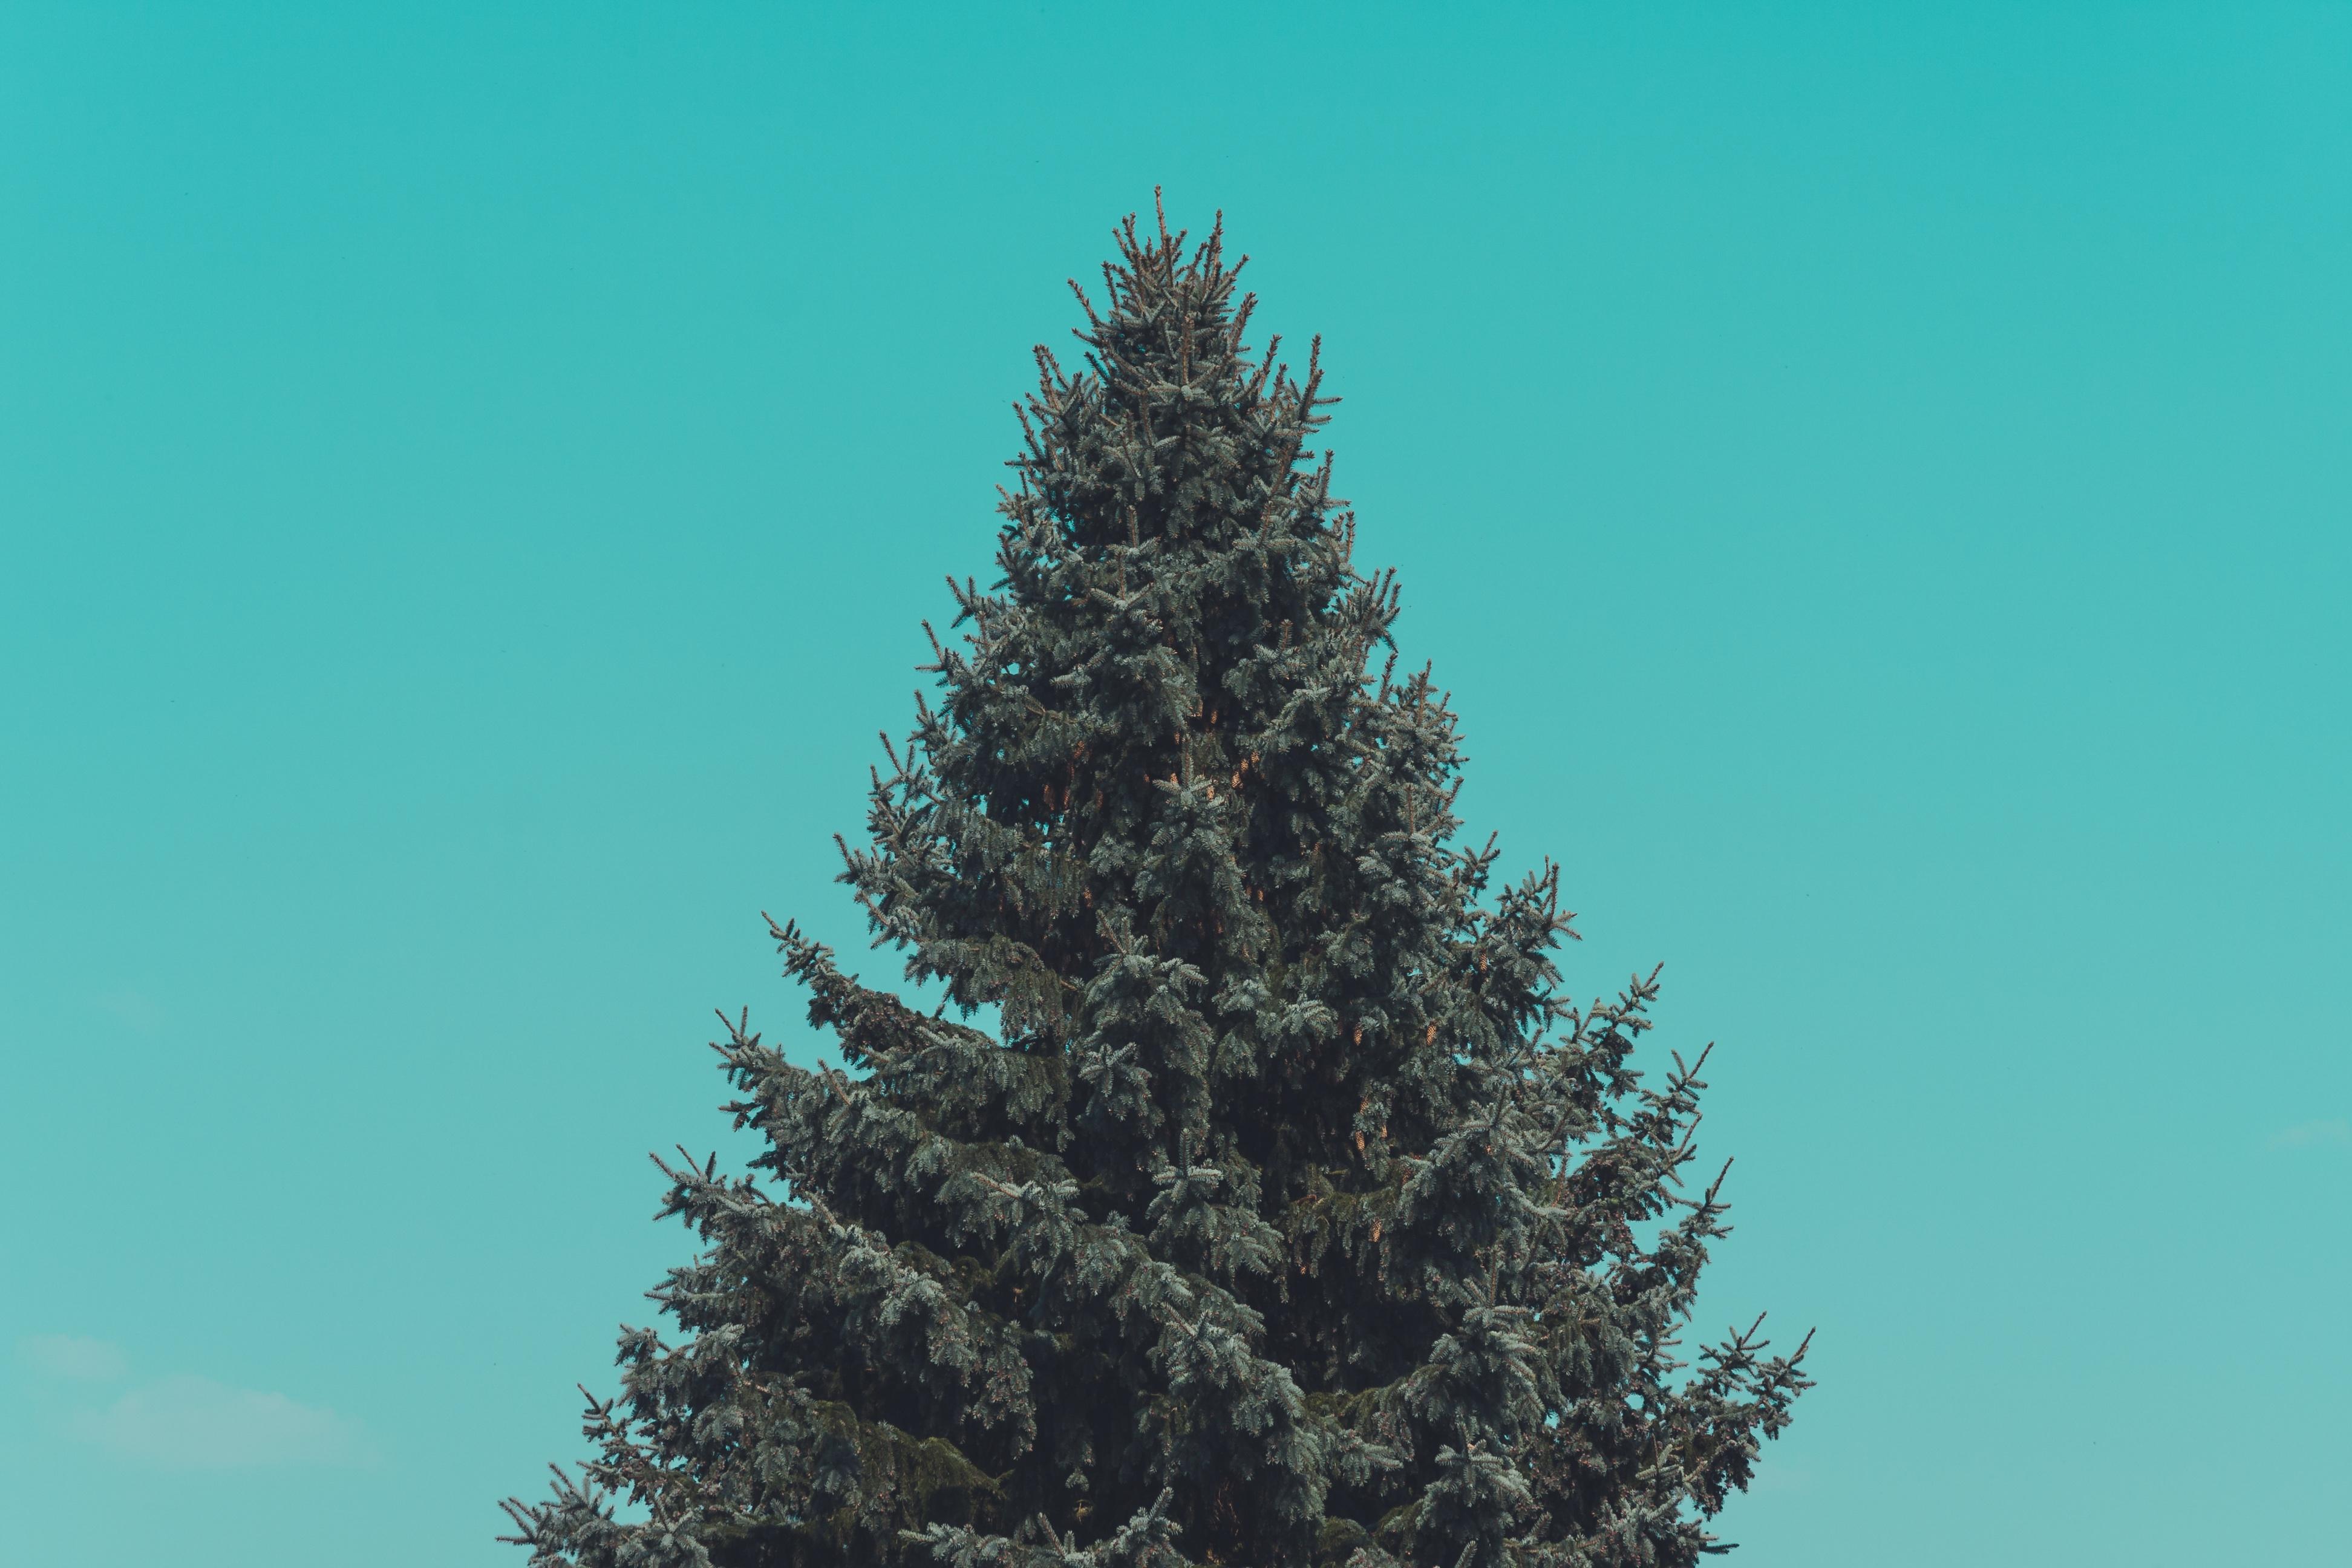 images gratuites branche plante ciel sapin arbre de. Black Bedroom Furniture Sets. Home Design Ideas